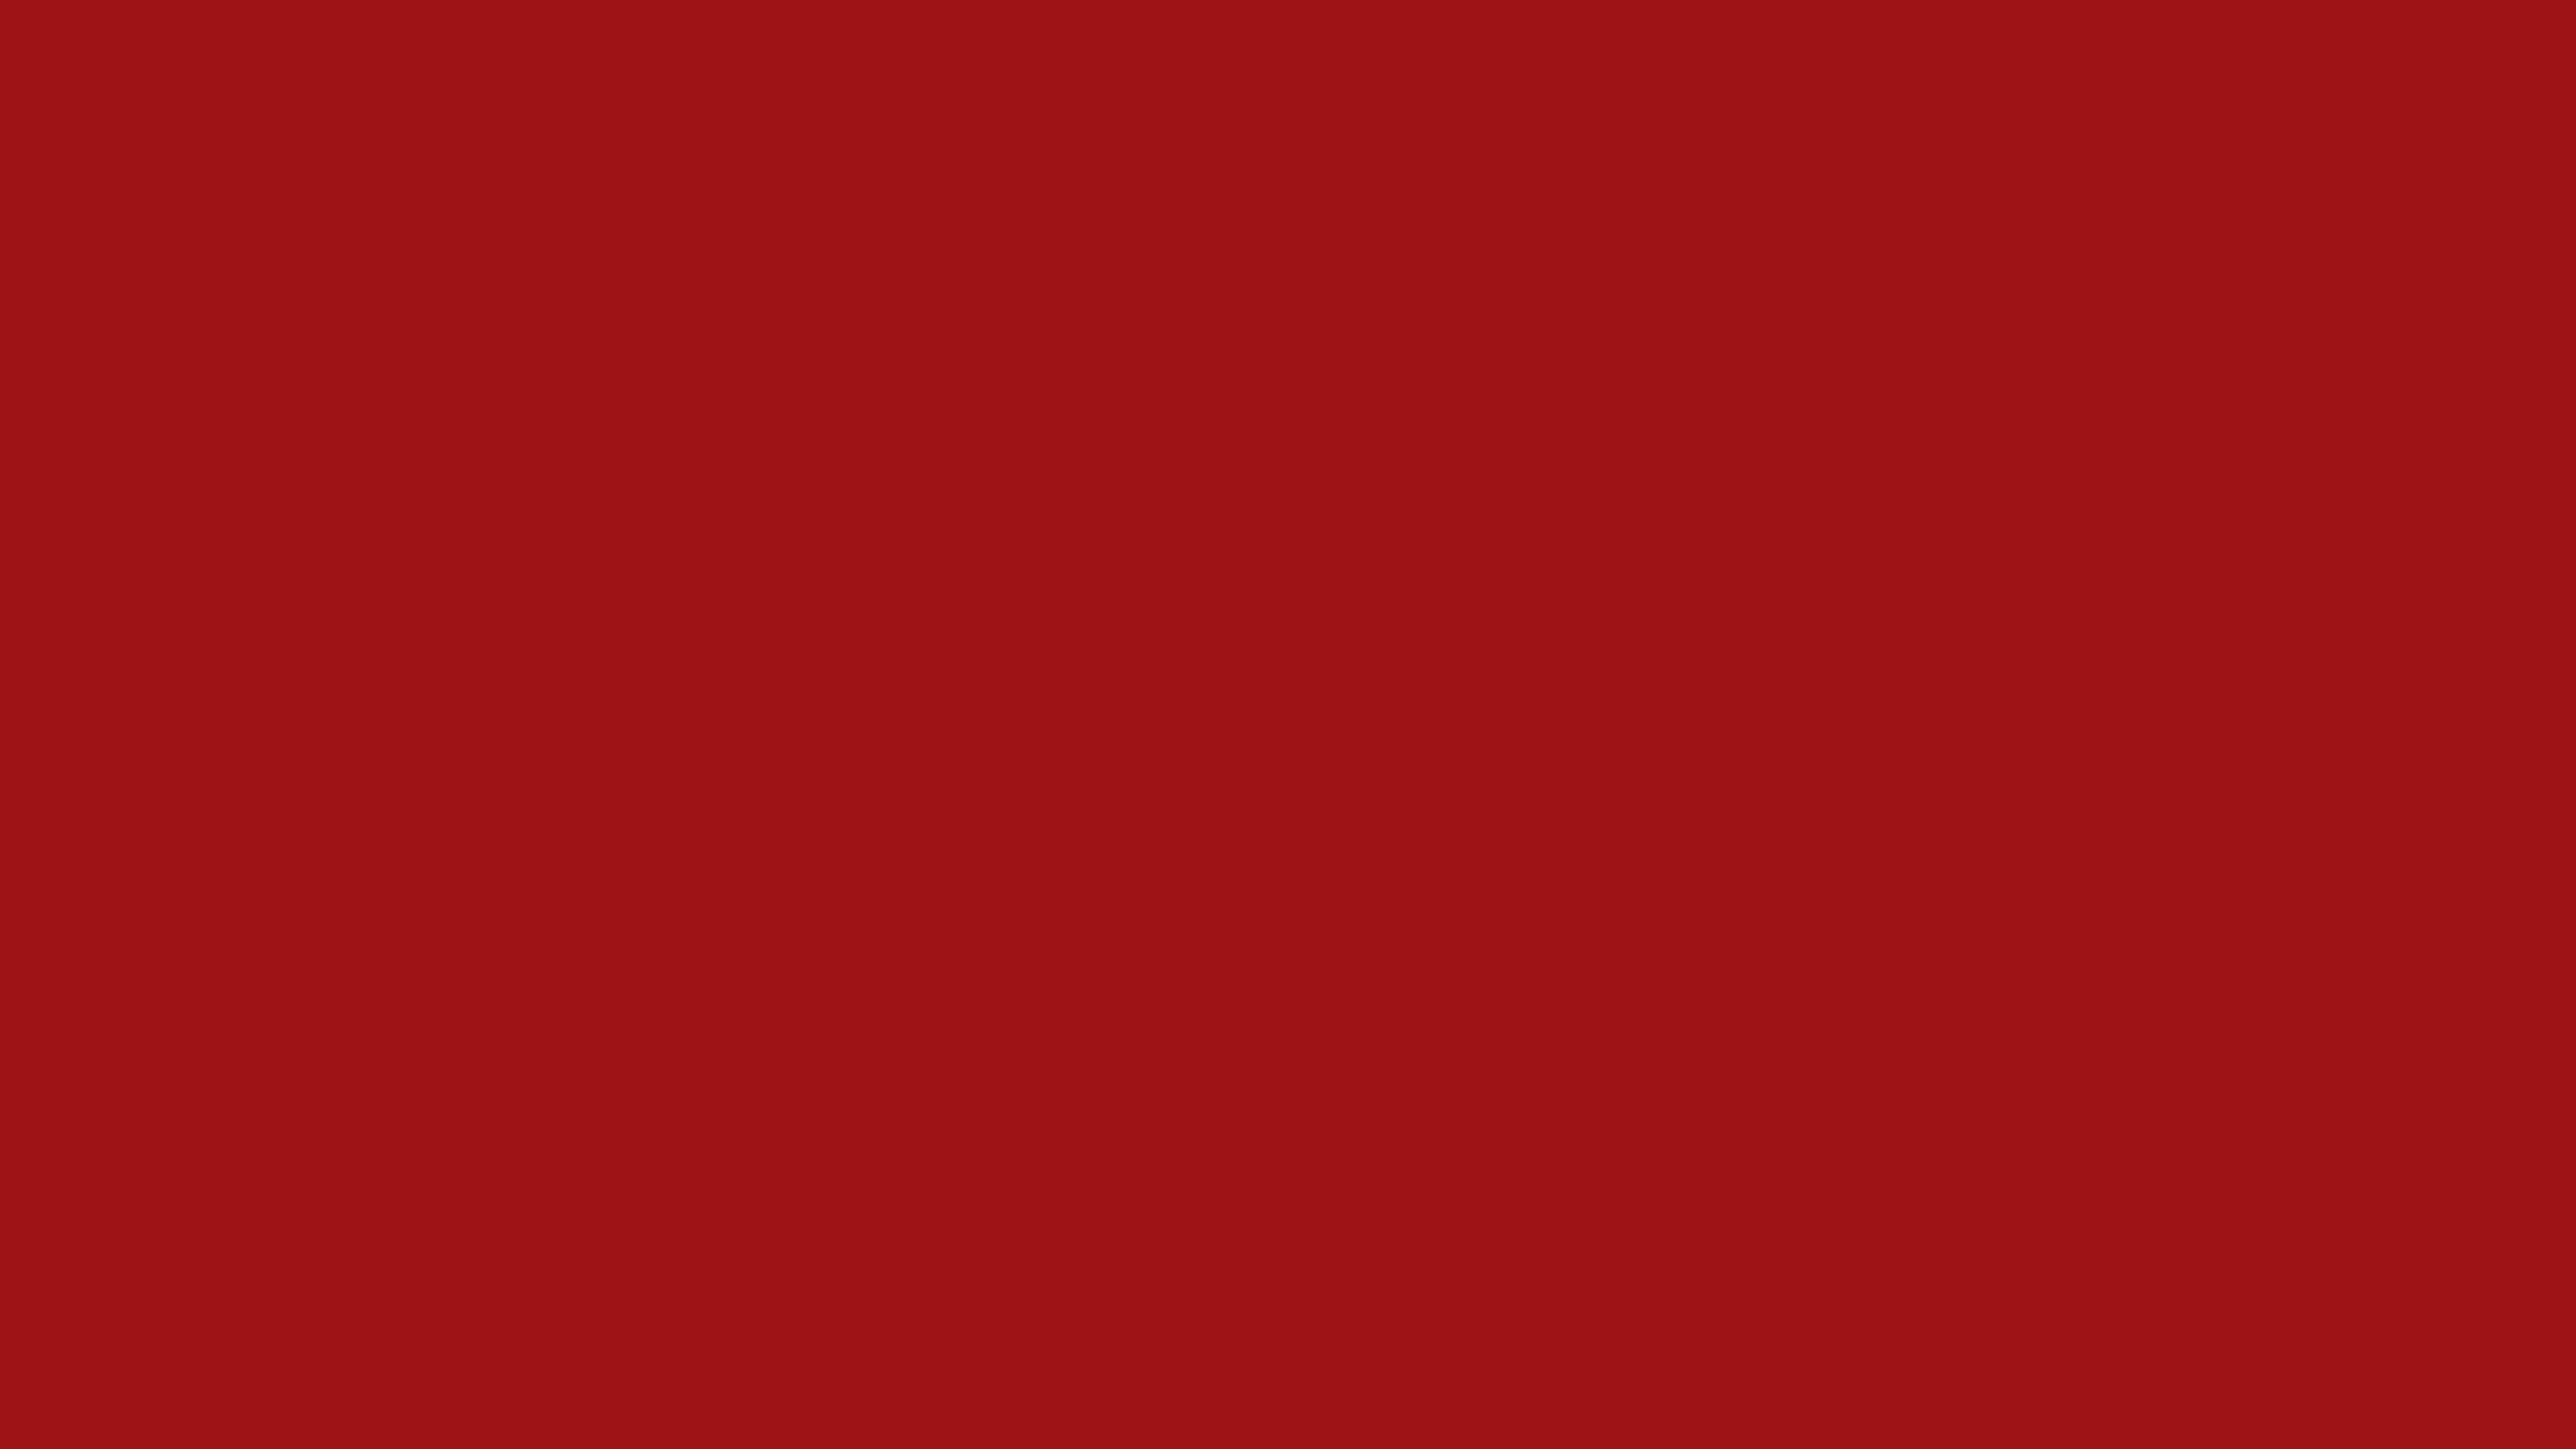 7680x4320 Spartan Crimson Solid Color Background